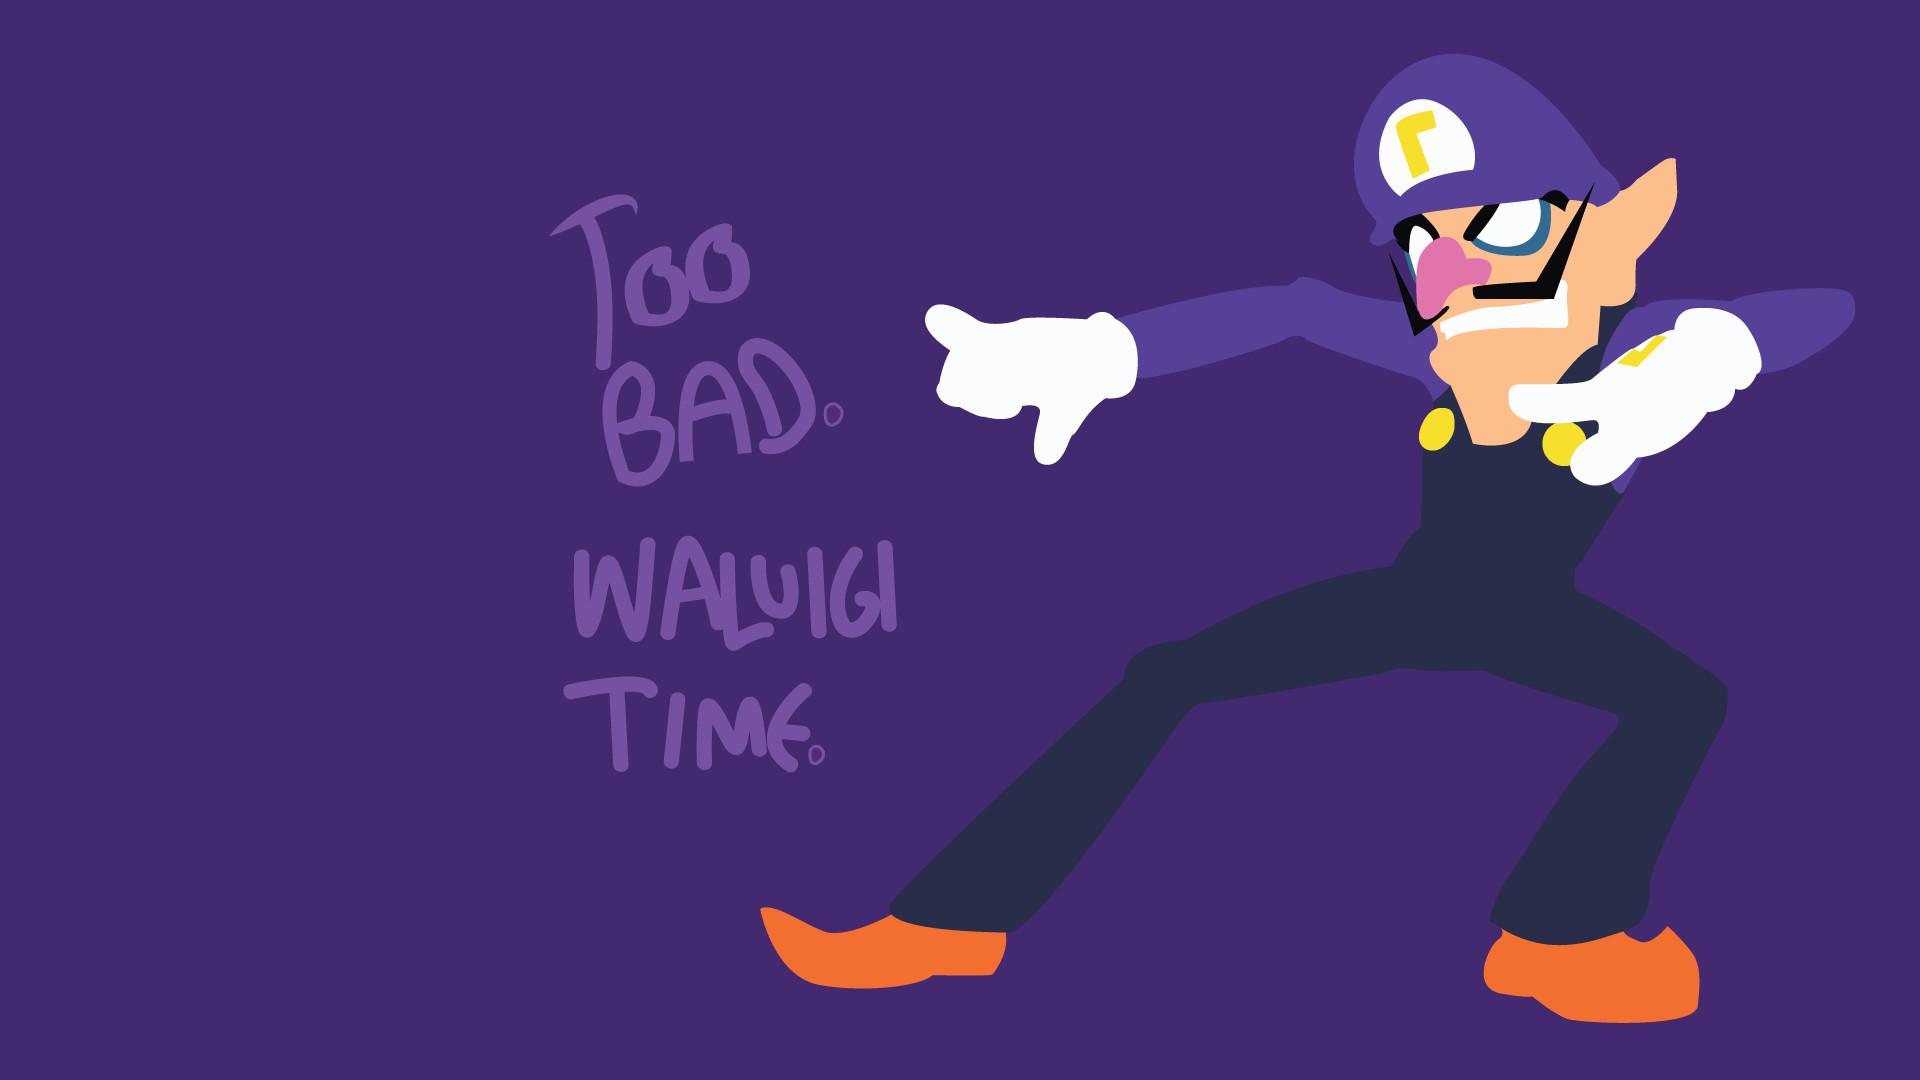 Too Bad. Waluigi Time. [1920×1080] (OC) | Wallpaper | Wallpapers